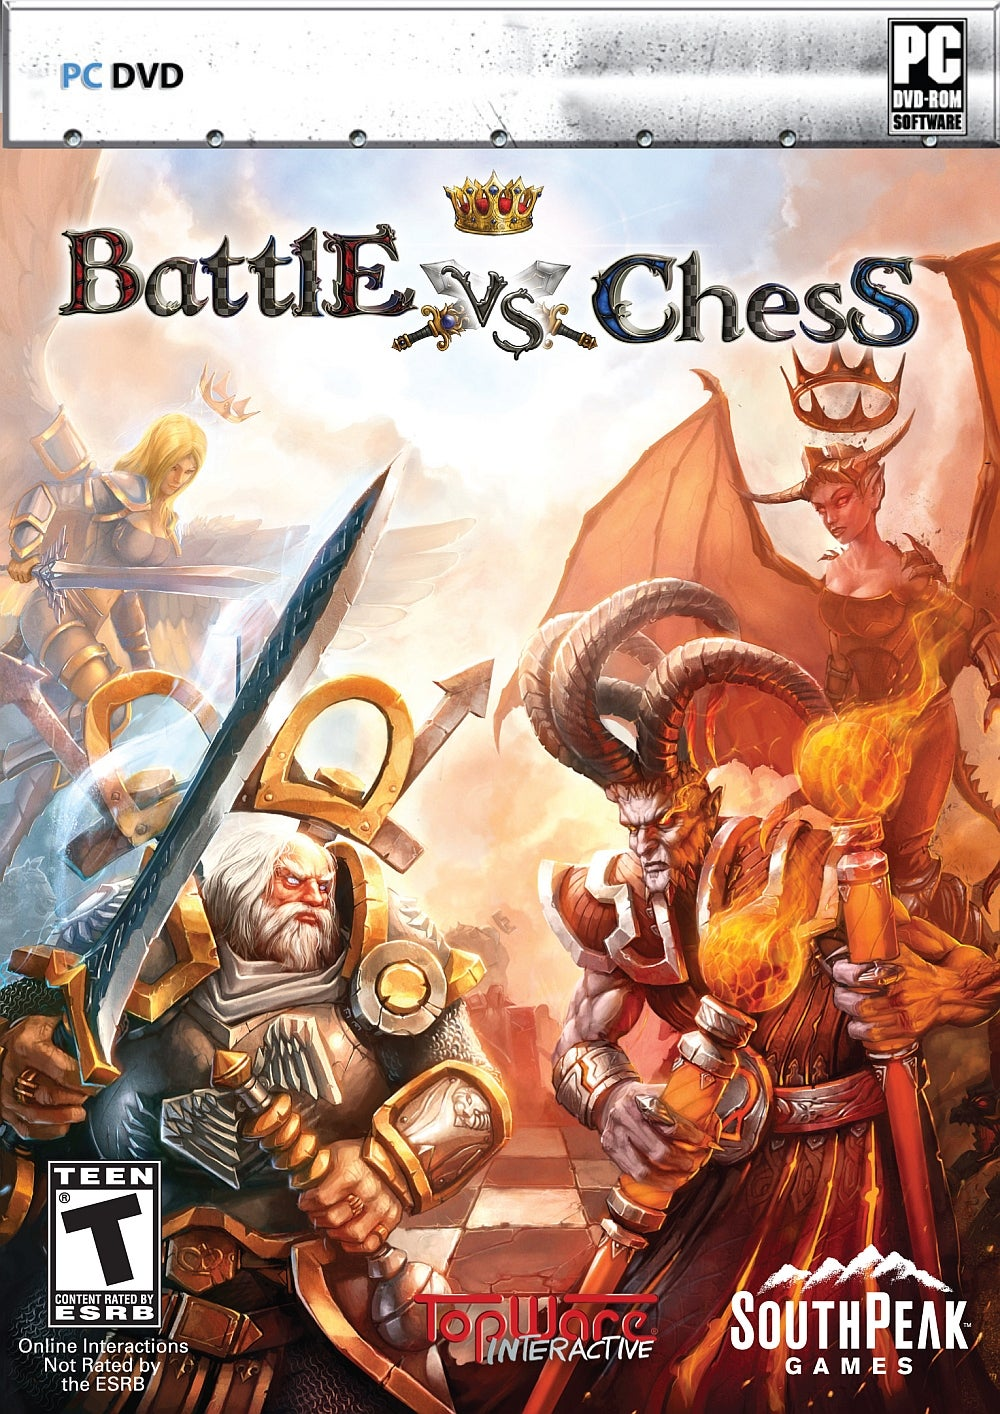 Battle VS Chess PC IGN